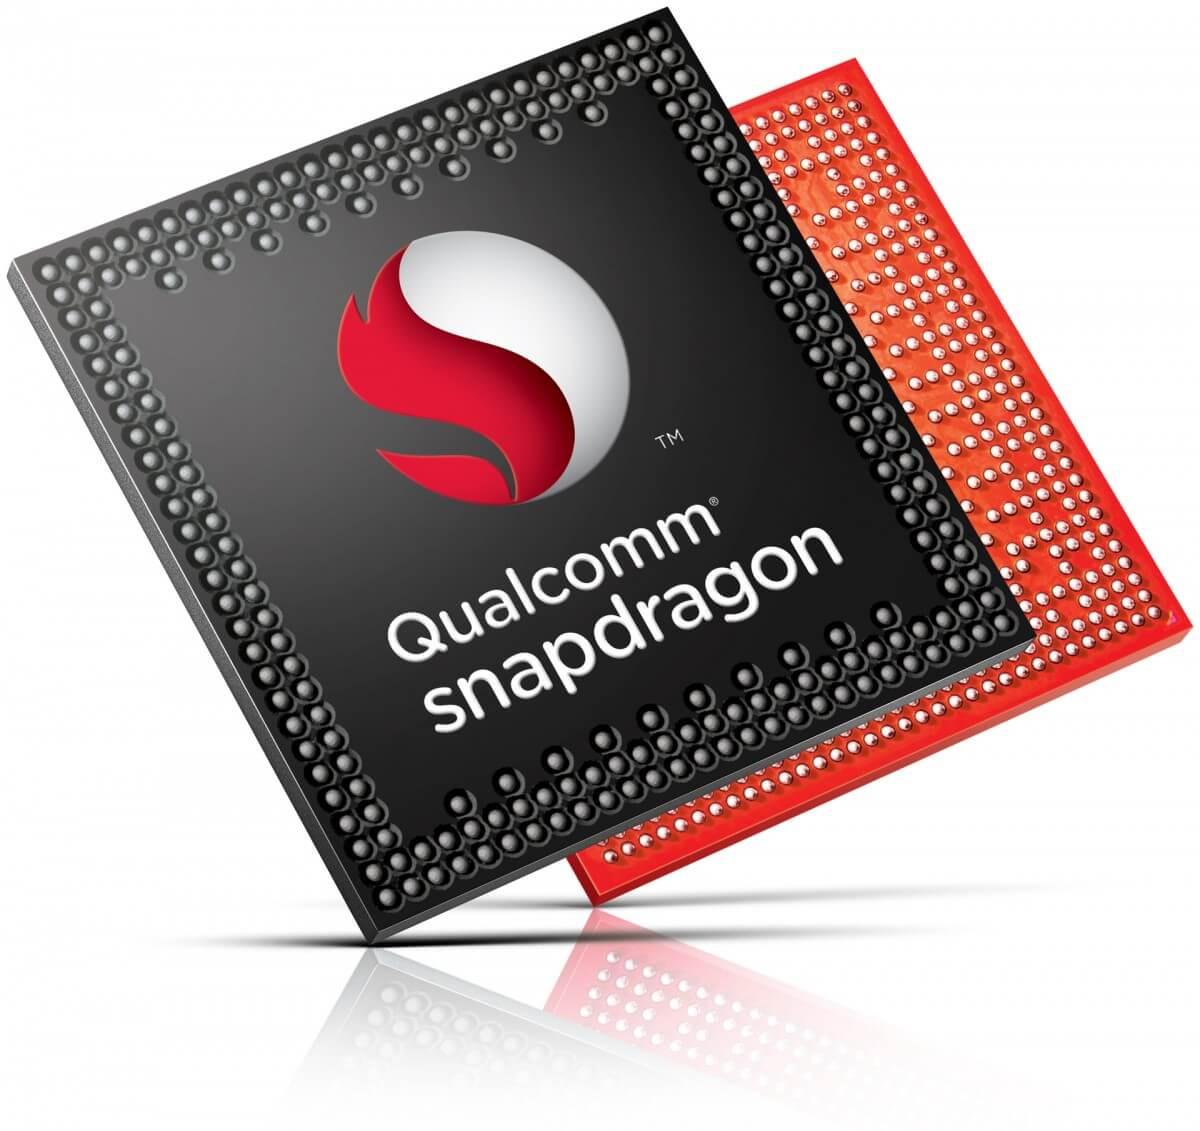 Procesorul Qualcom SnapDragon 820